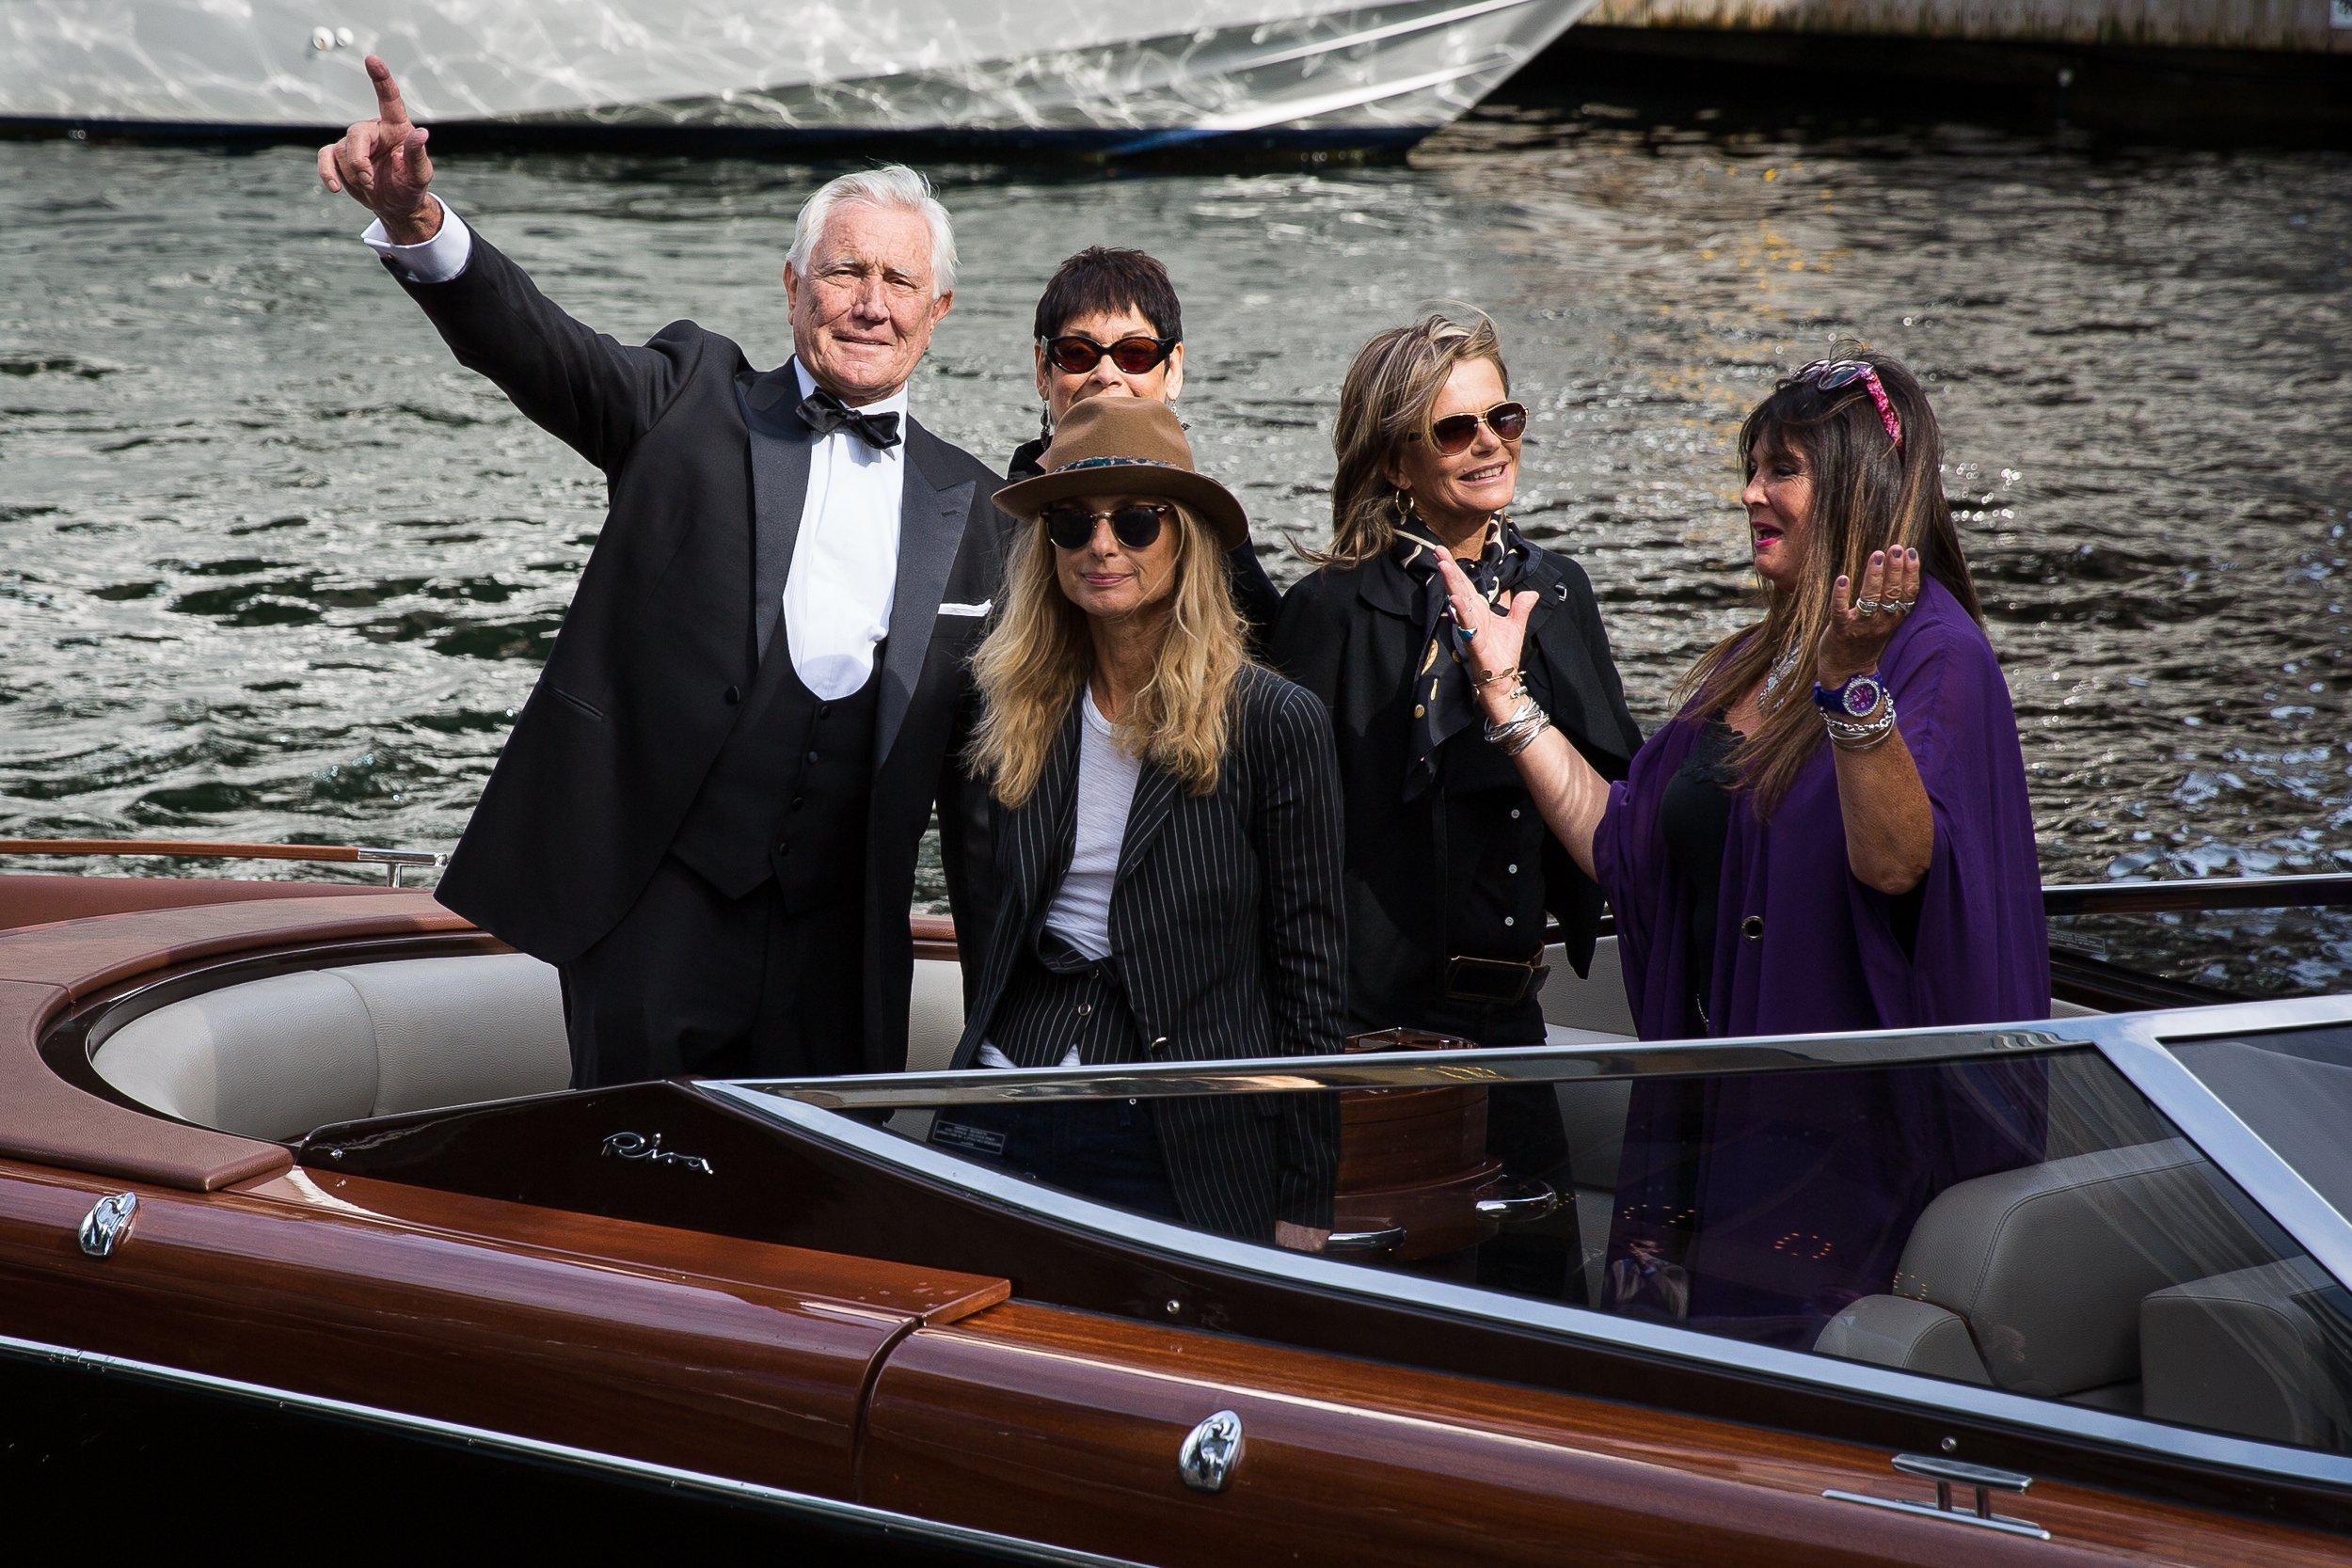 James-Bond-Oslo-George-Lazenby-Girls